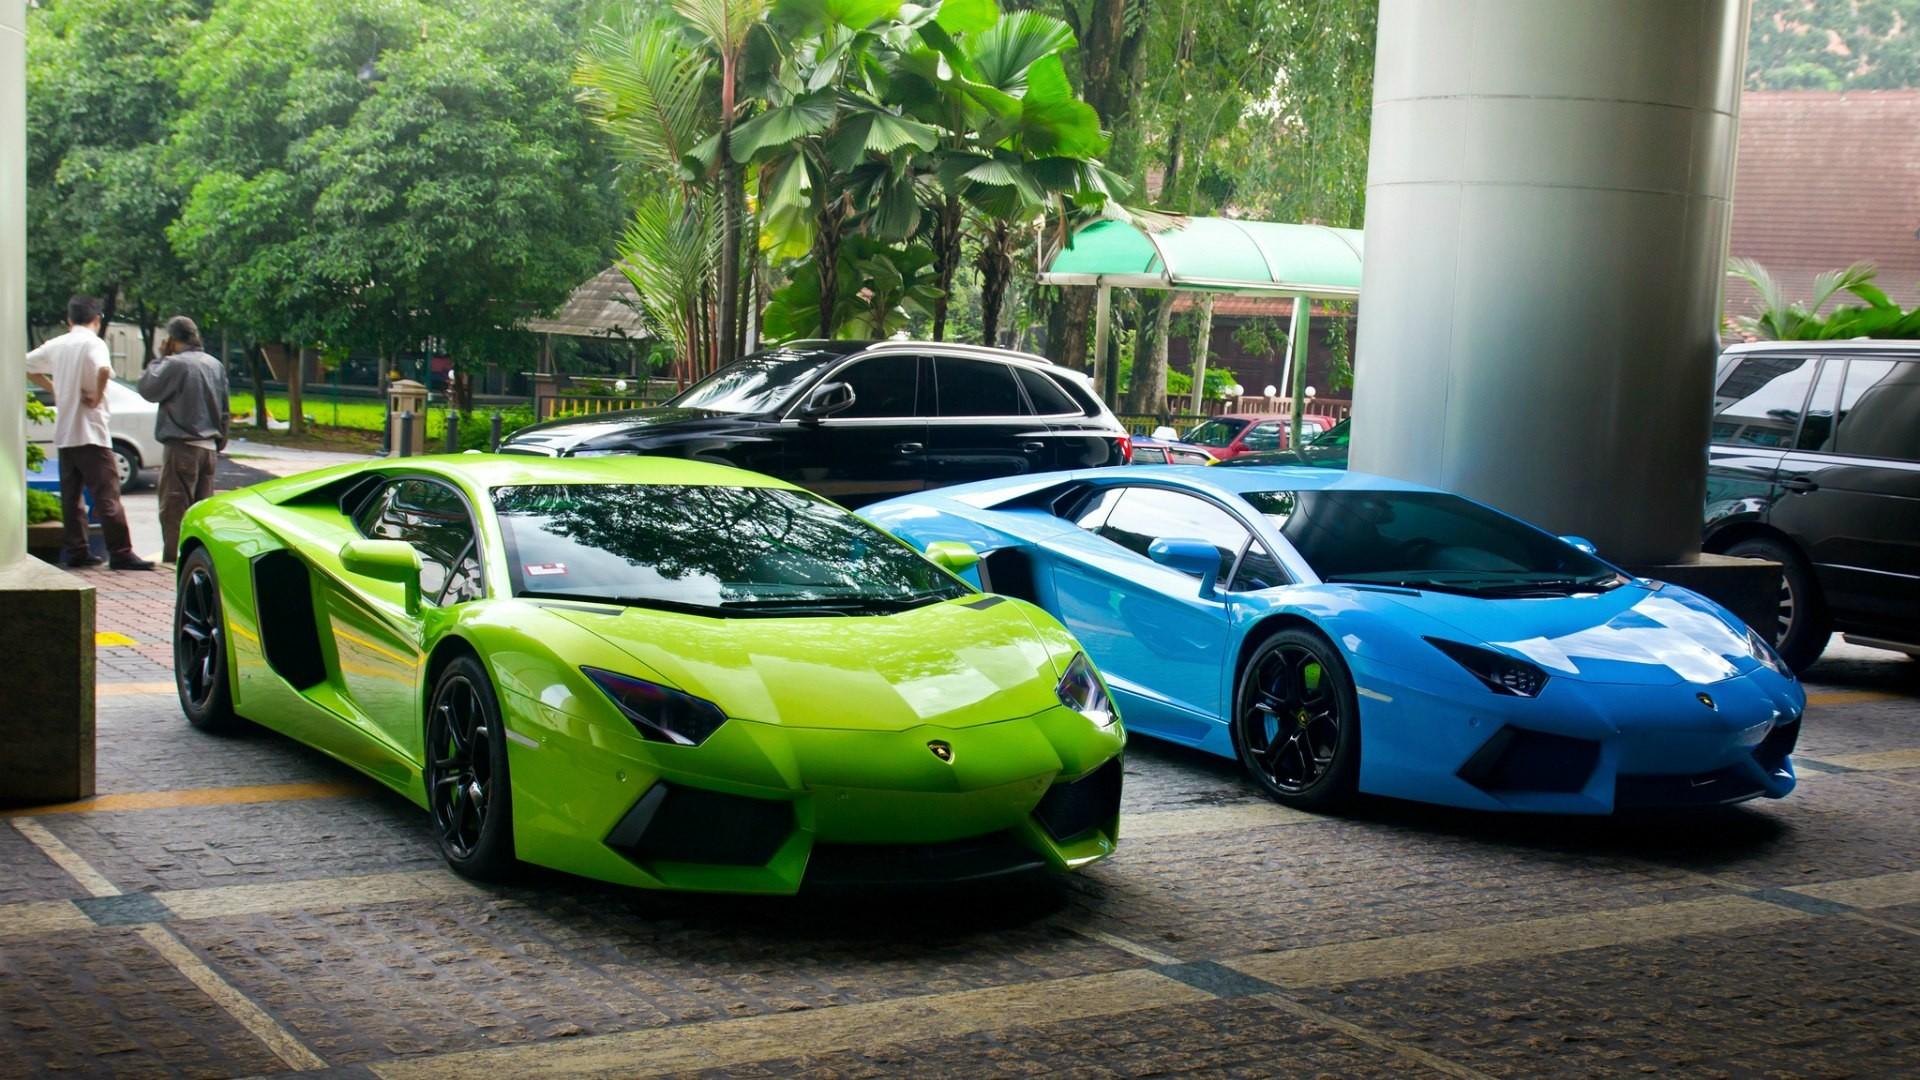 Green And Blue Lamborghini Wallpapers 1080p